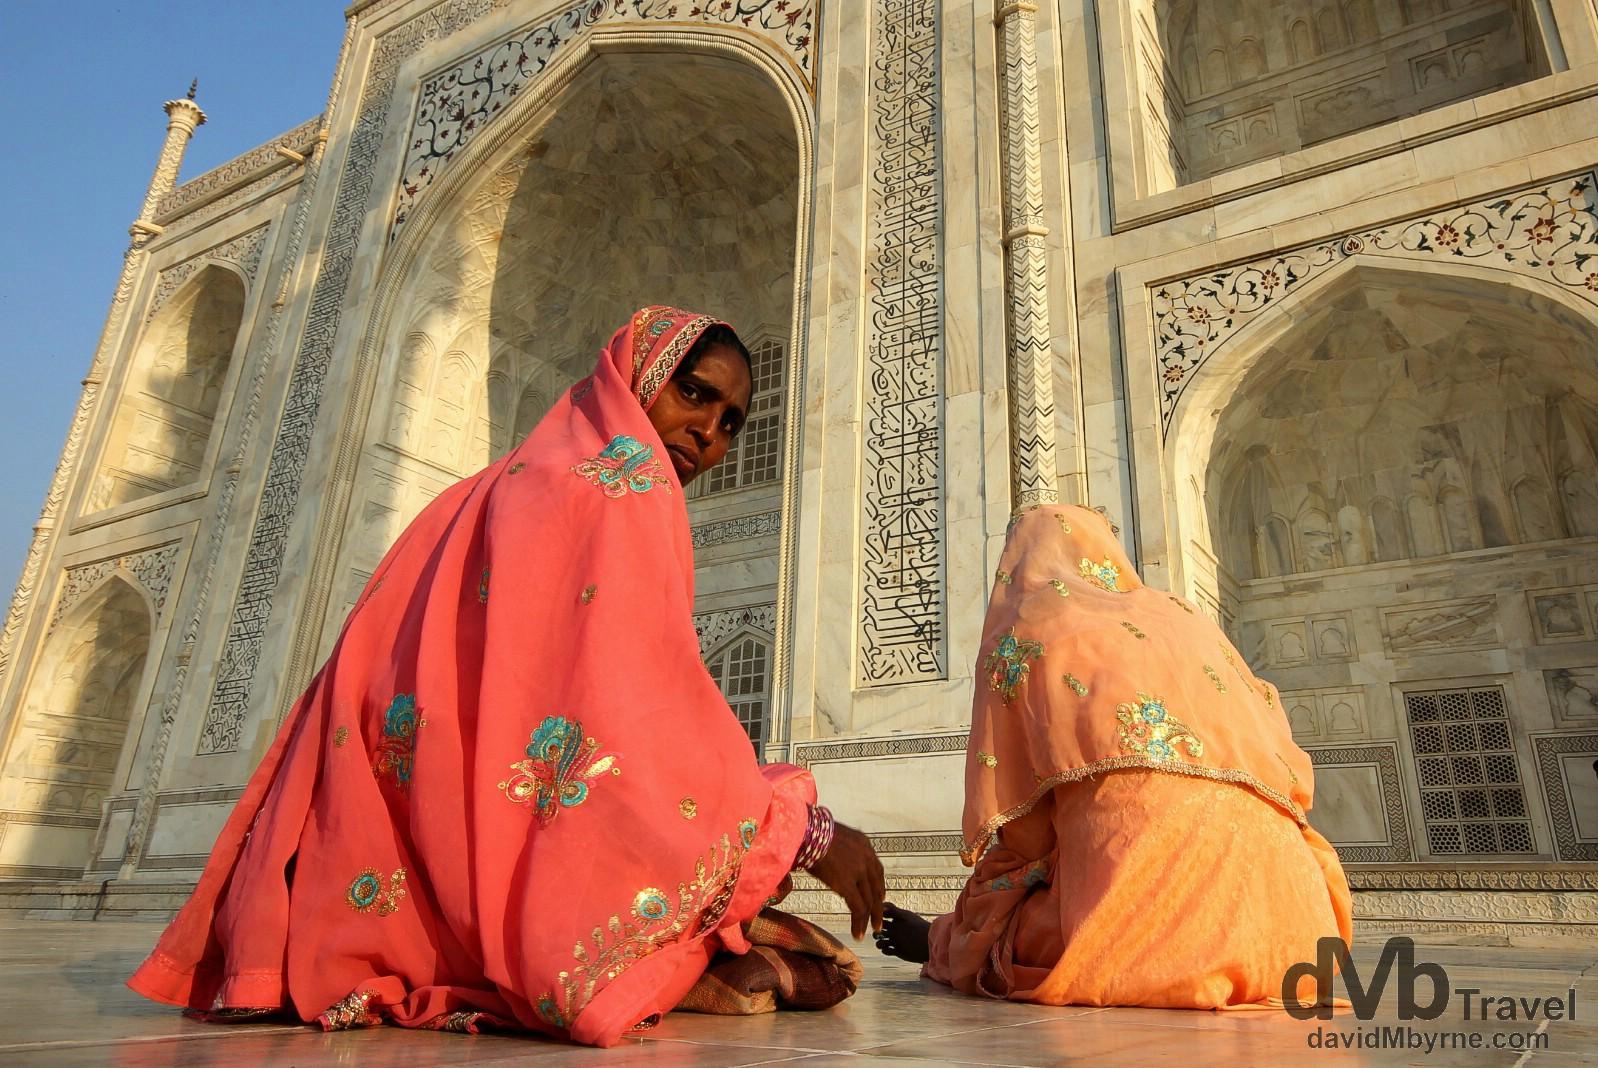 Sitting on the raised marble platform surrounding the Taj Mahal just after sunset. Agra, Uttar Pradesh, India. October 11th 2012.